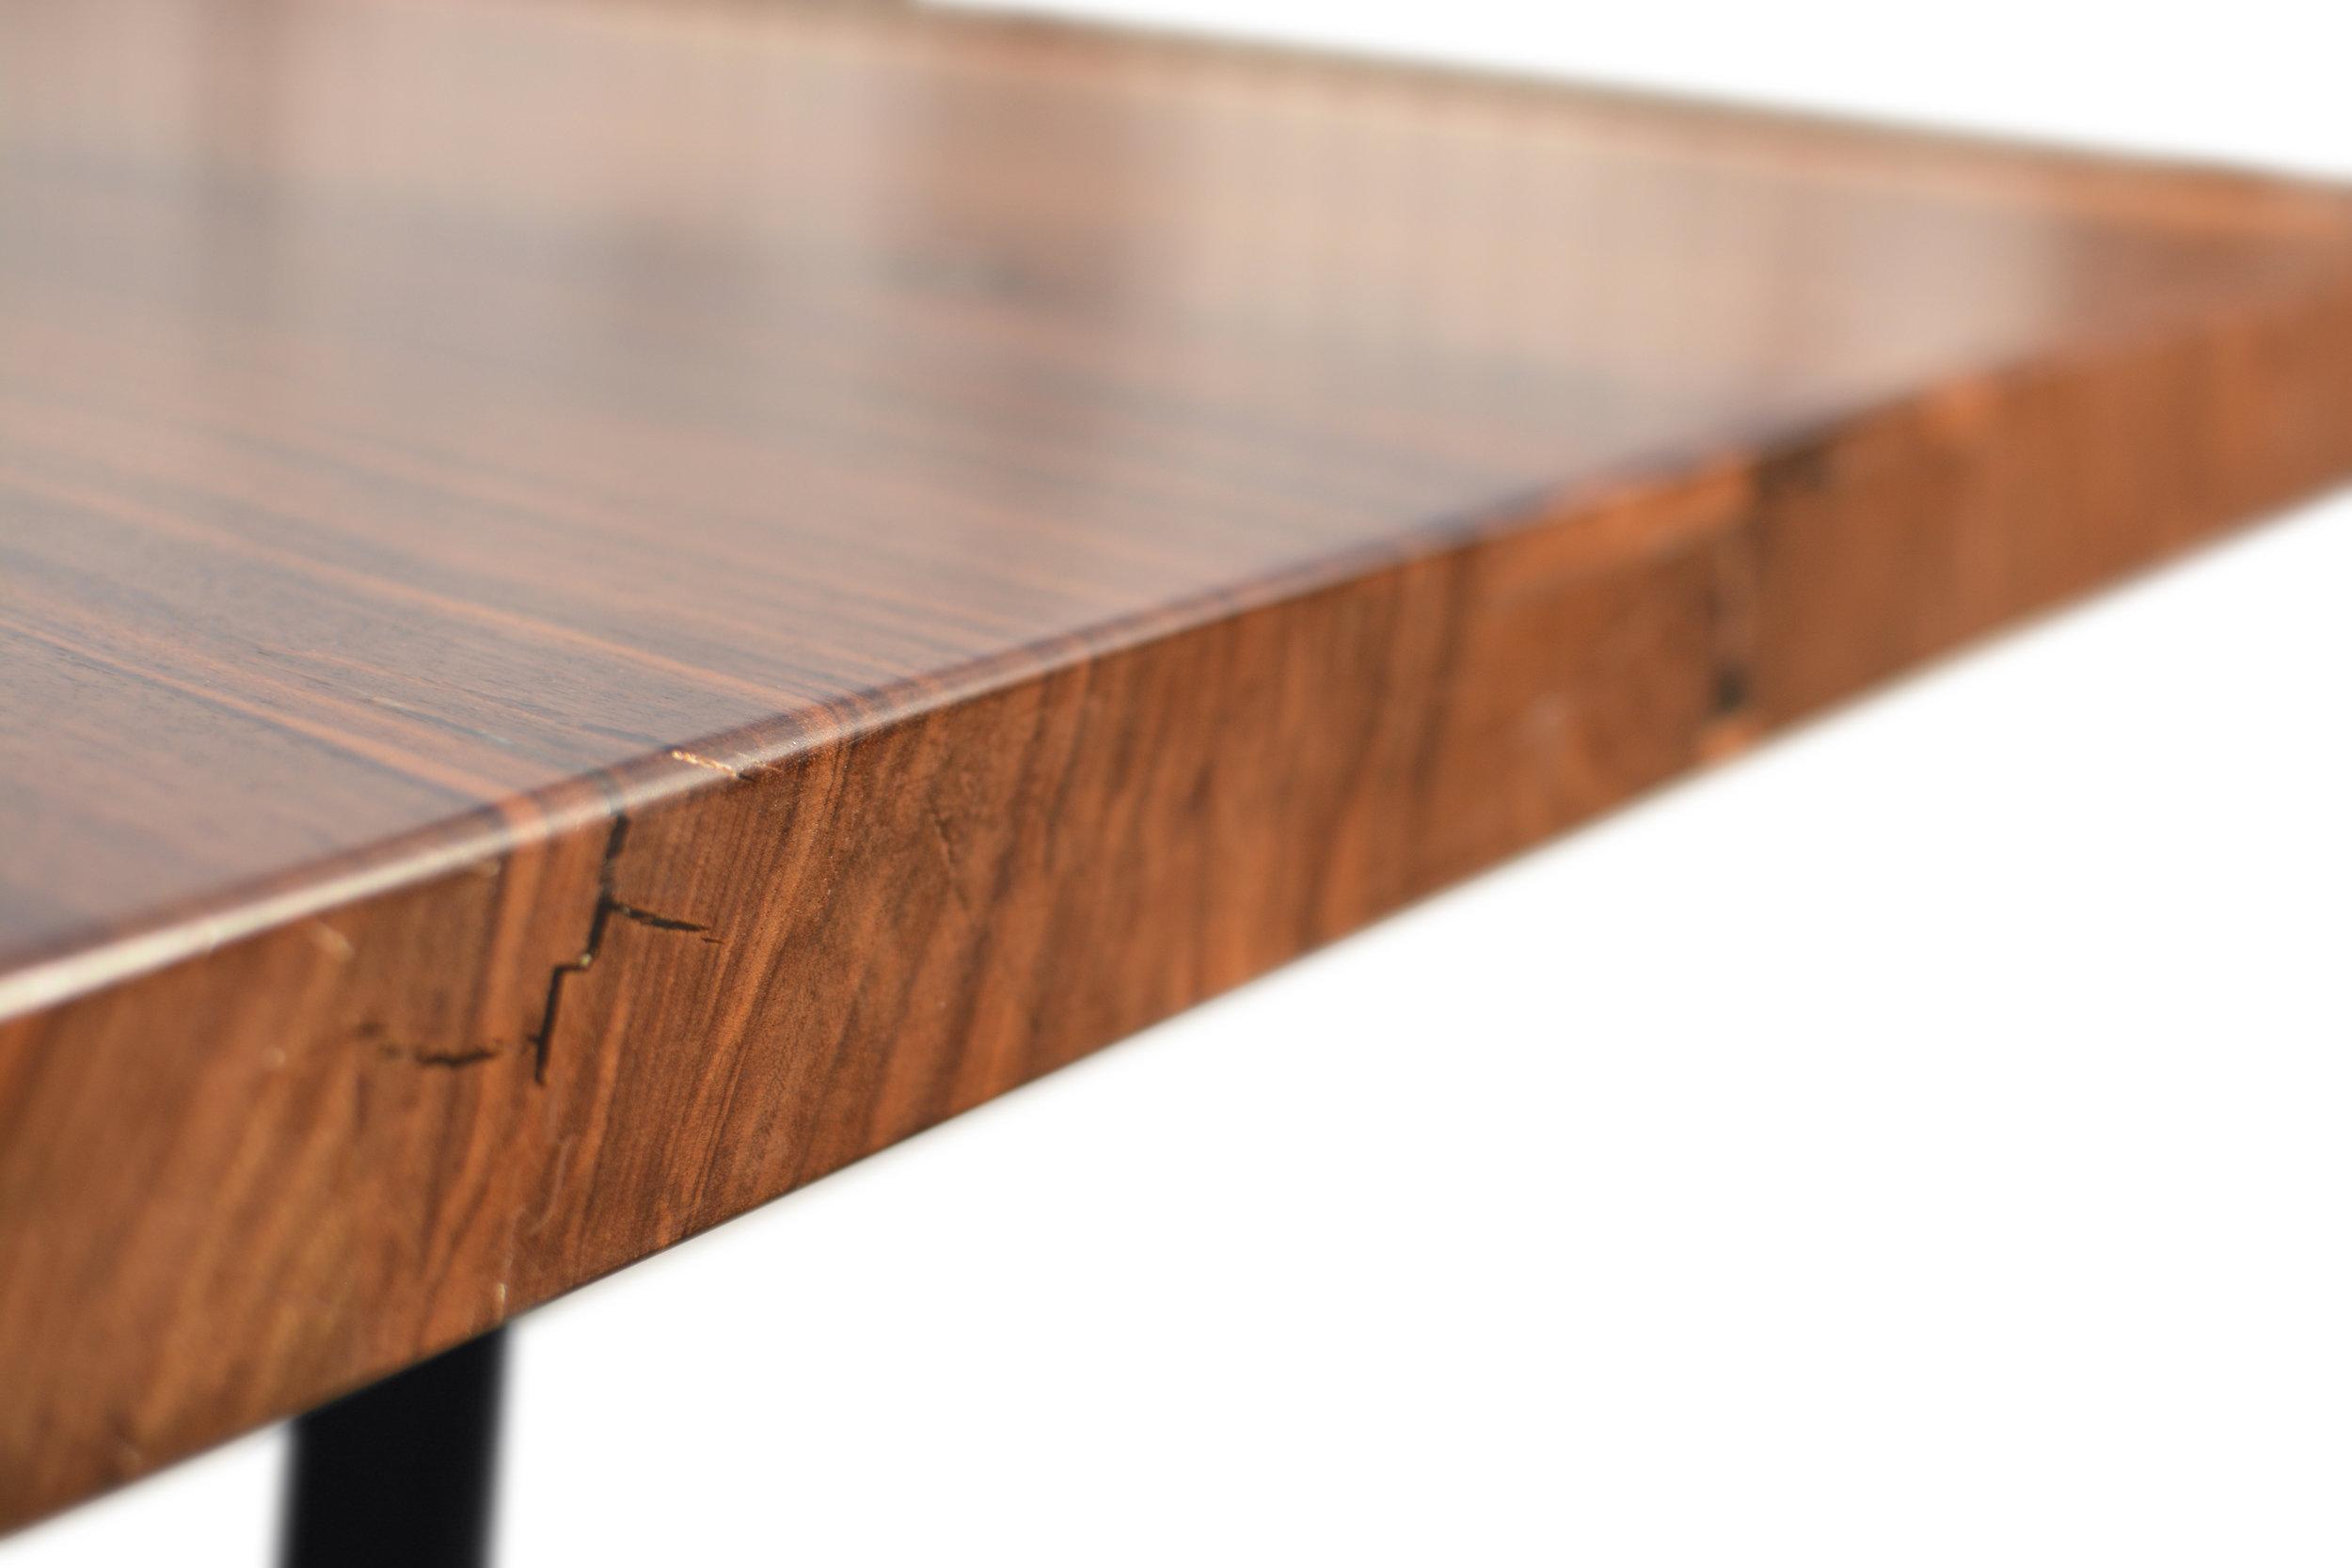 Etz & Steel Hermes Live Edge Walnut Table Close Up 3.JPG